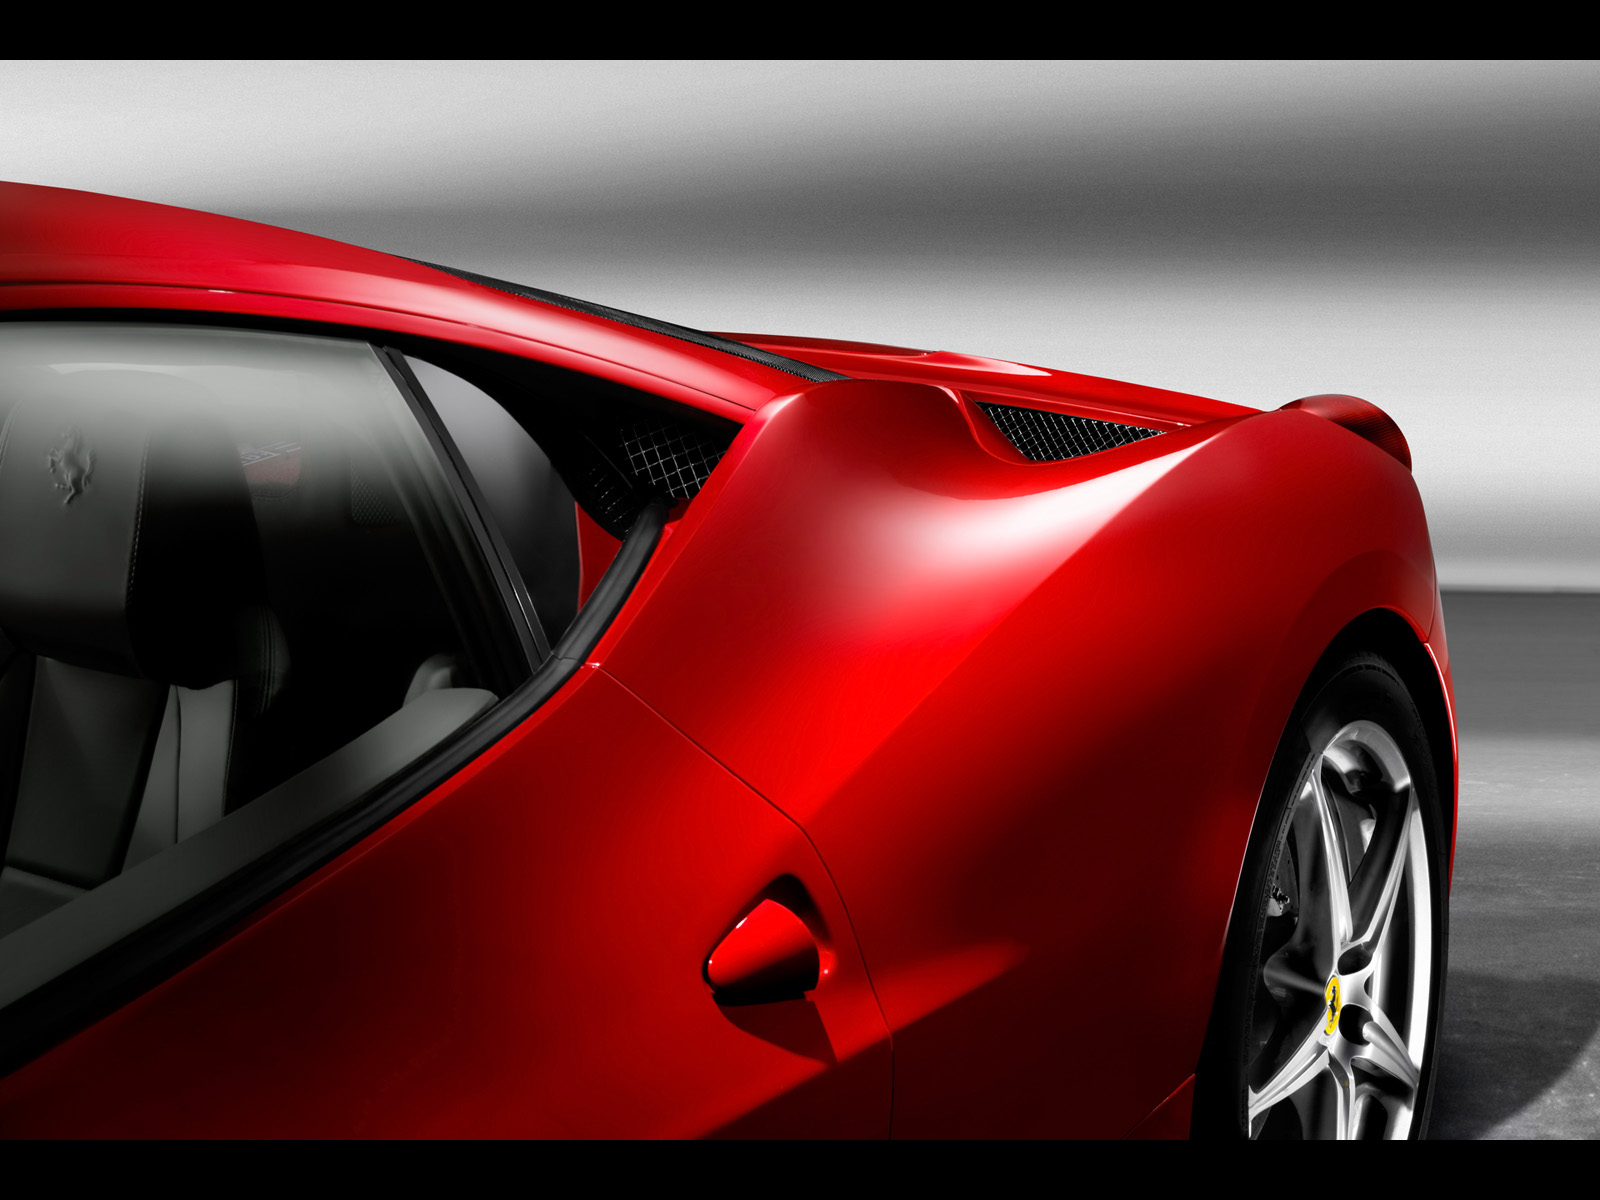 http://2.bp.blogspot.com/_viCh1SFyGrA/TOWj_05o9OI/AAAAAAAAAFE/2_iJpy5LmE8/s1600/2010-Ferrari-458-Italia-Rear-Section-1600x1200.jpg